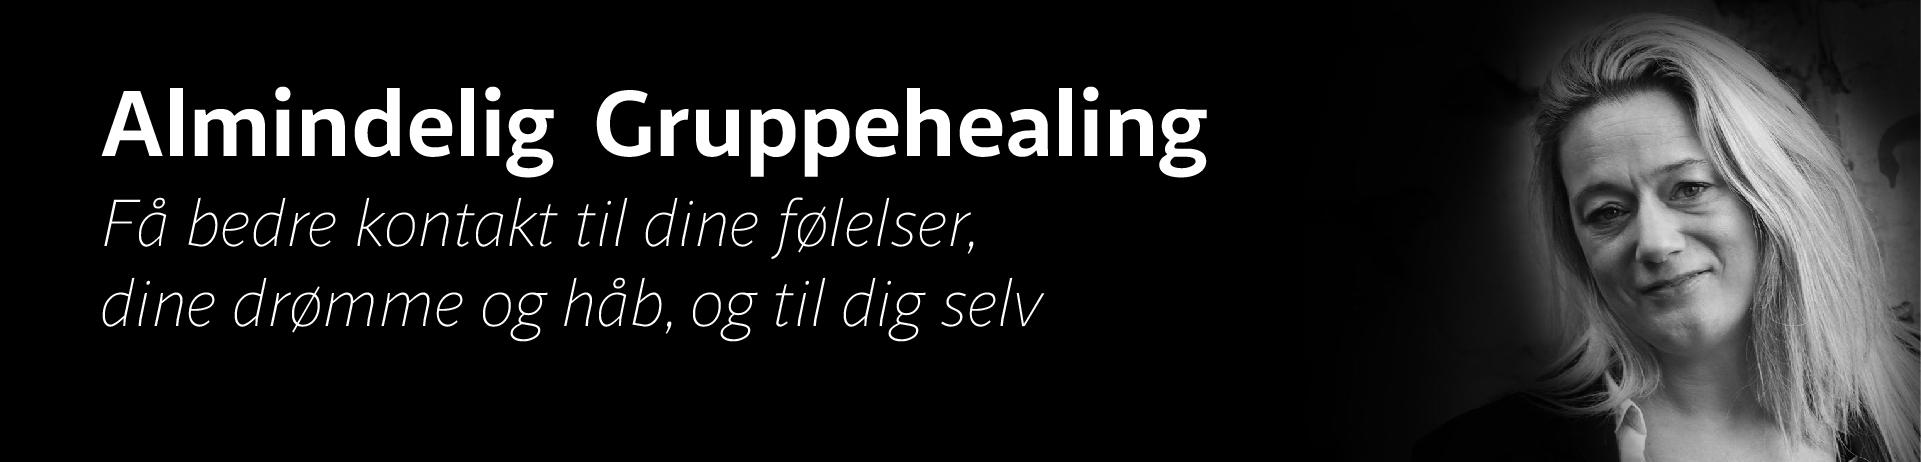 AlmGruppehealing-PK_1